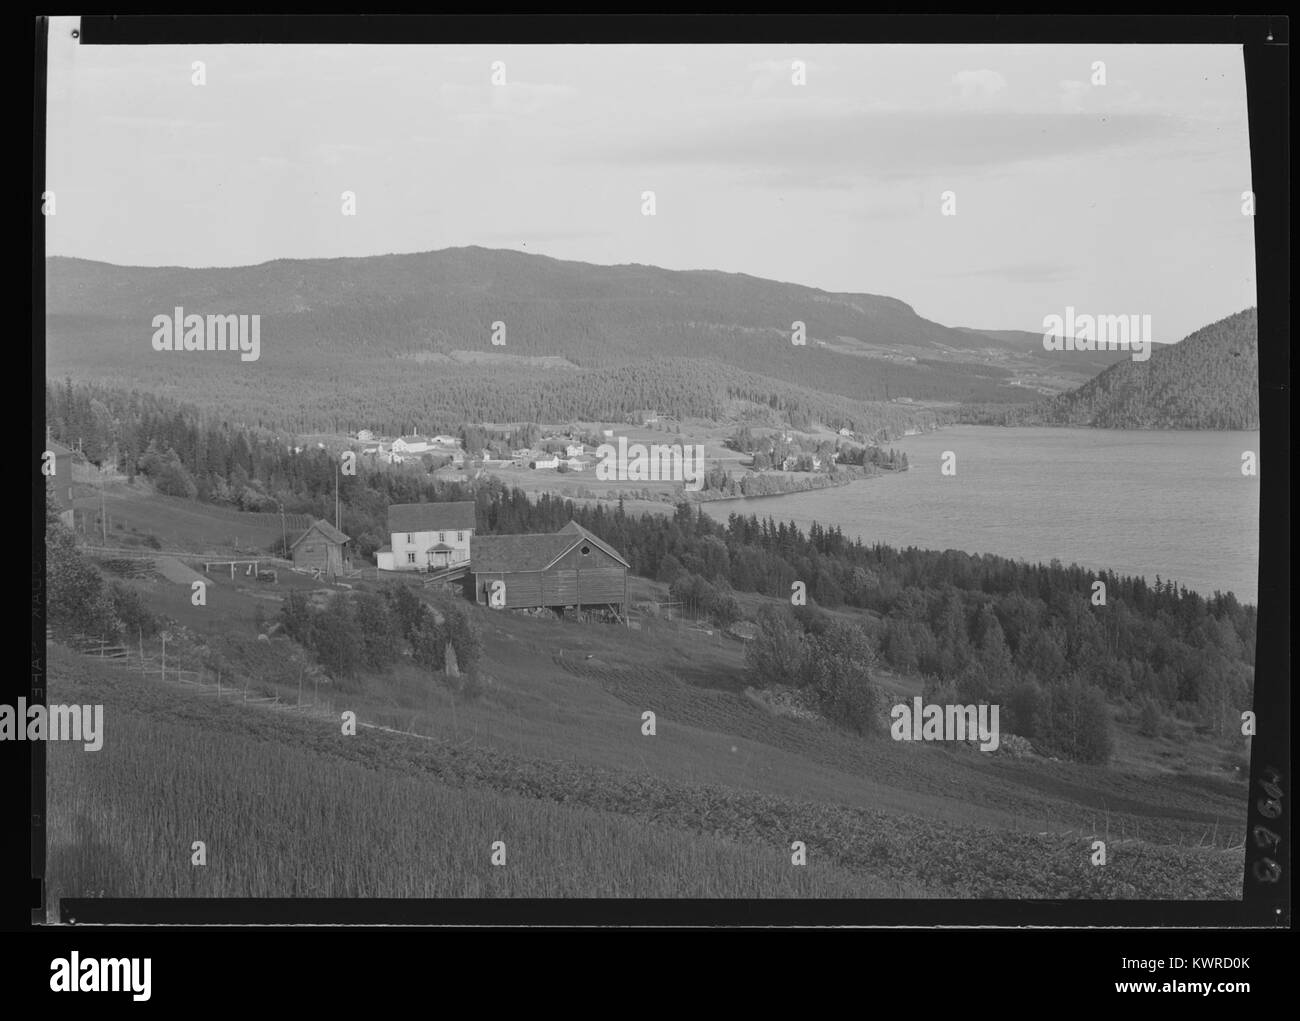 Øystre Slidre - no-nb digifoto 20160303 00039 NB MIT FNR 07063 - Stock Image